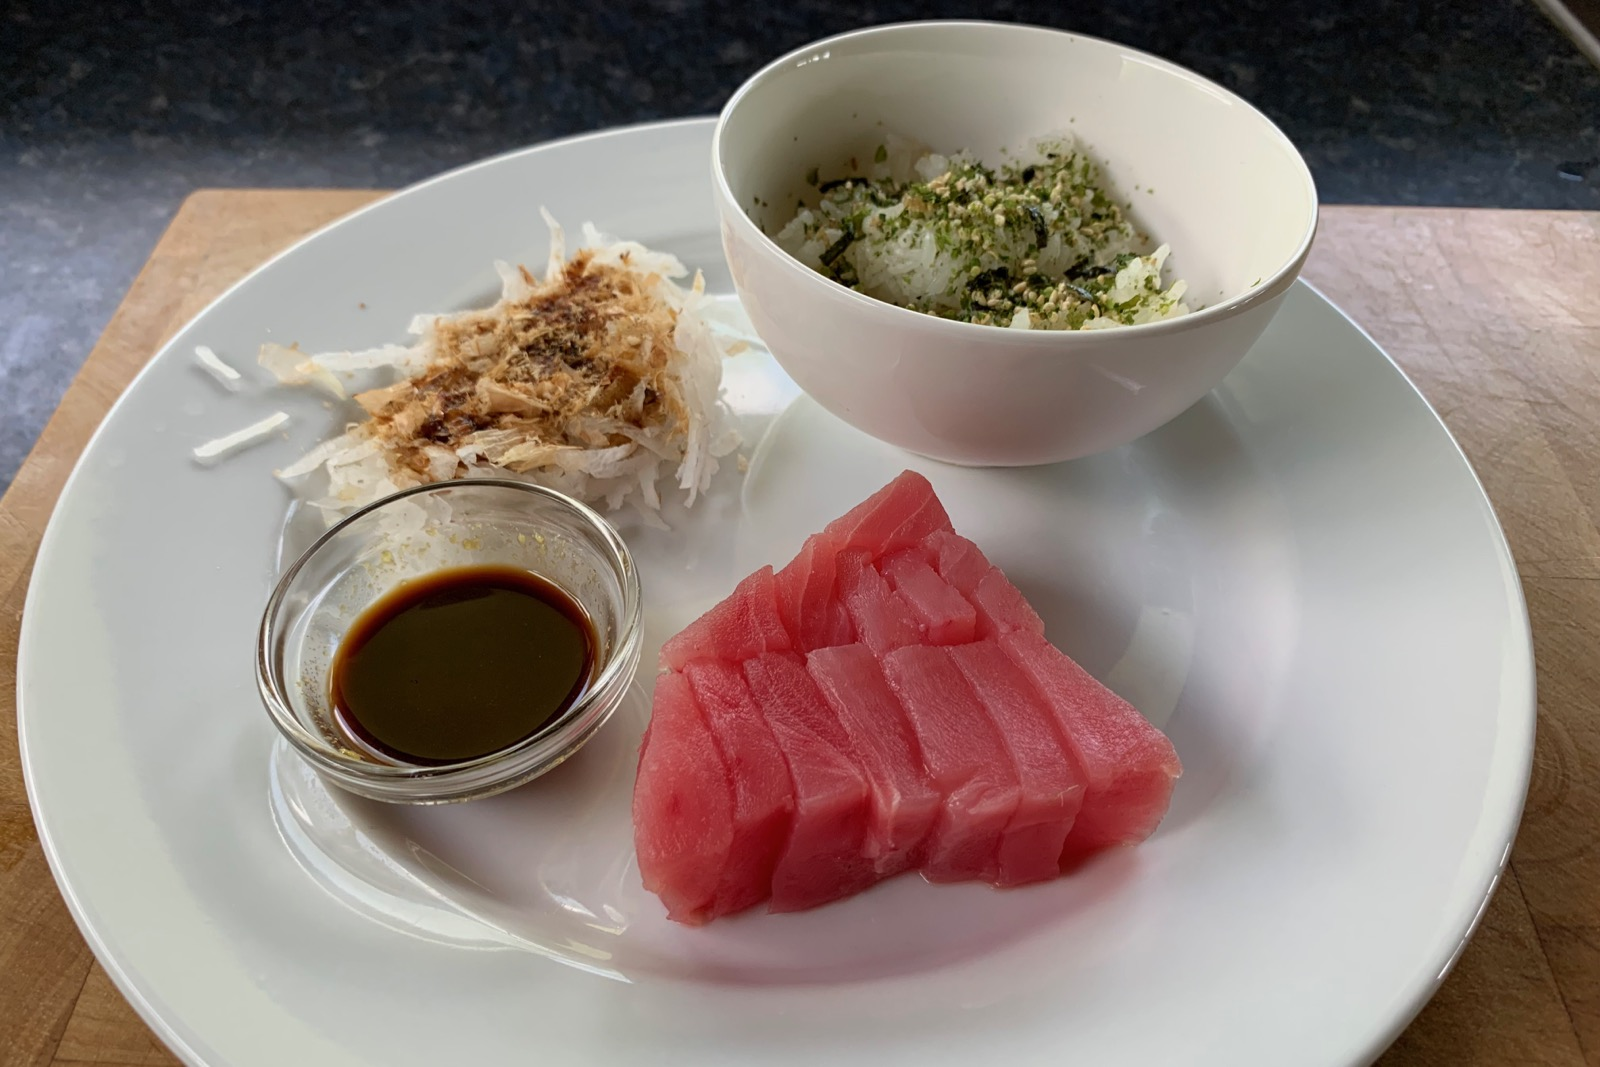 http://blog.rickk.com/food/2019/08/04/ate.2019.08.04.d.jpg